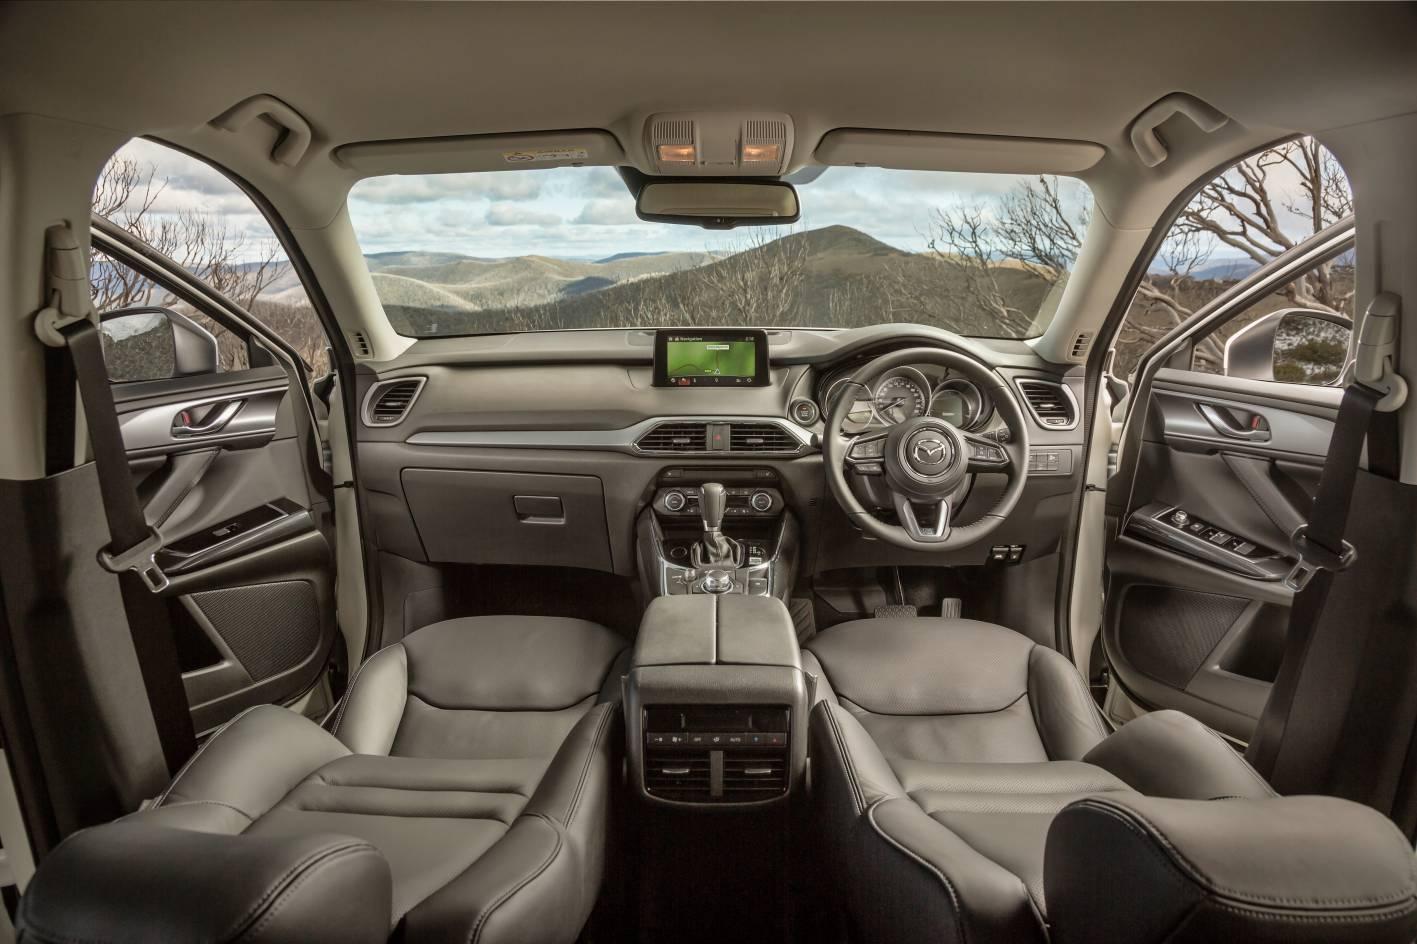 Marvelous 2017 Mazda Cx 9 Touring Interior Forcegt Com Creativecarmelina Interior Chair Design Creativecarmelinacom